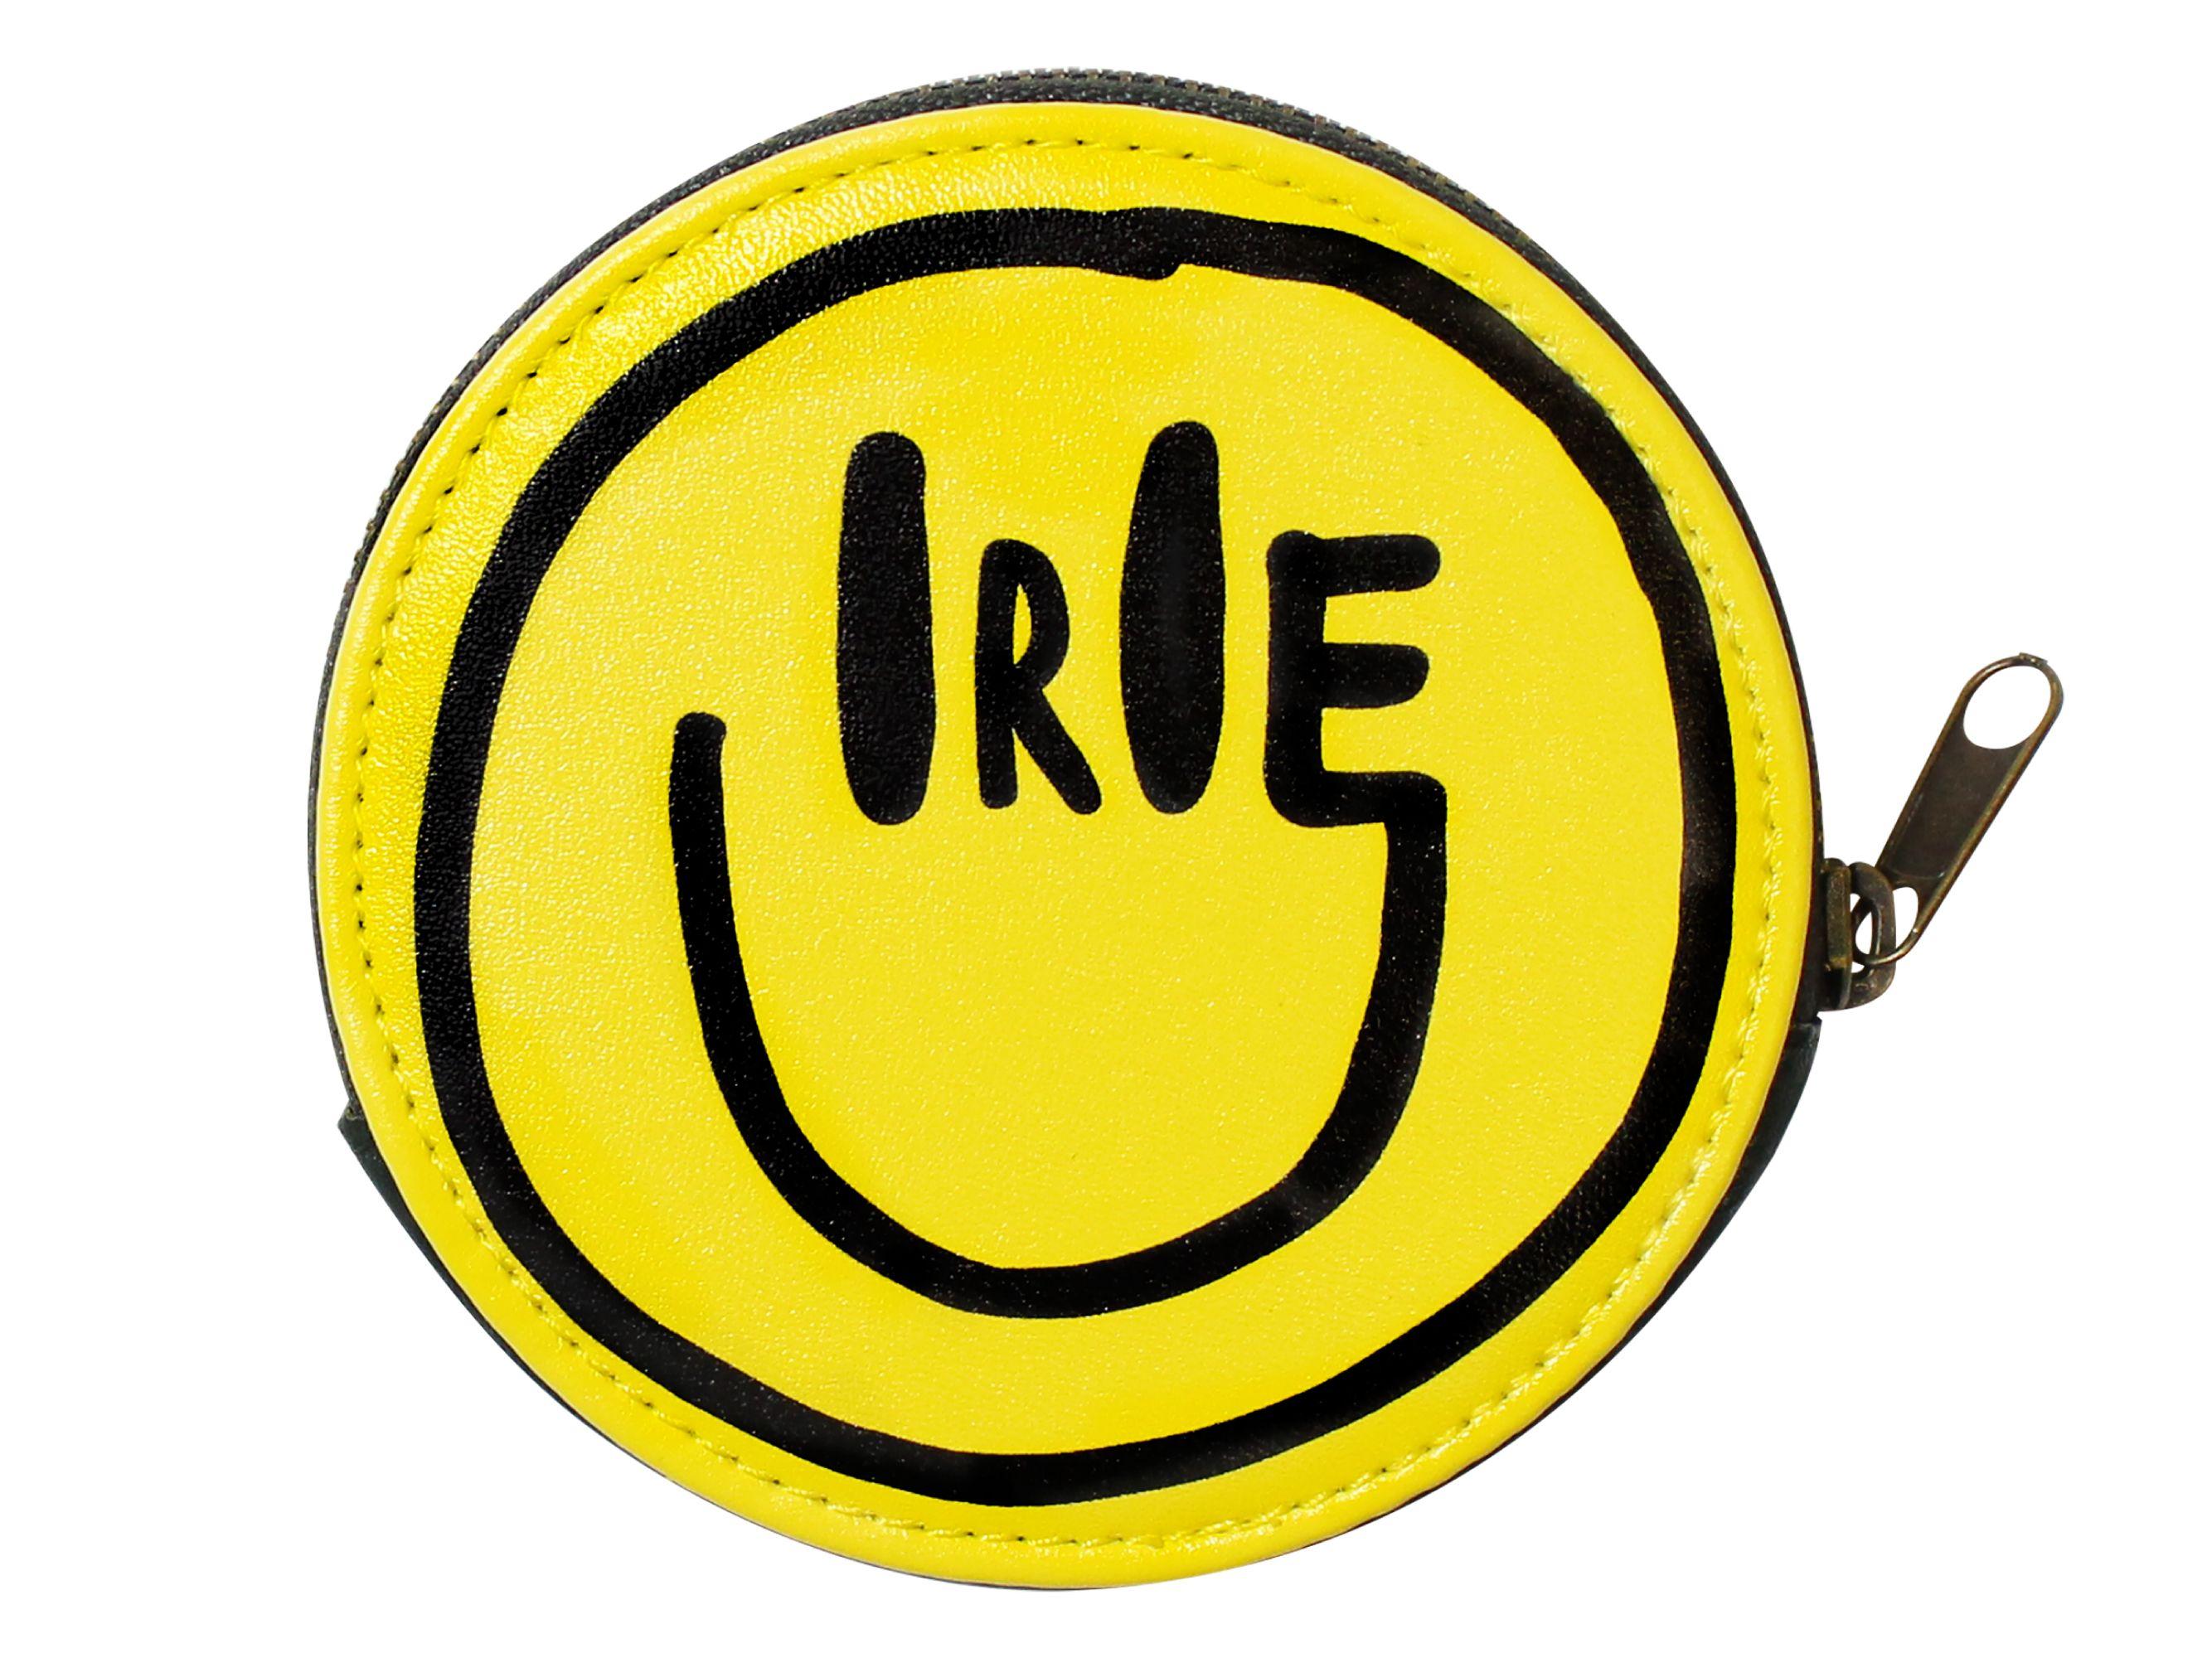 SMIRIE COIN CASE -IRIEby irielife-